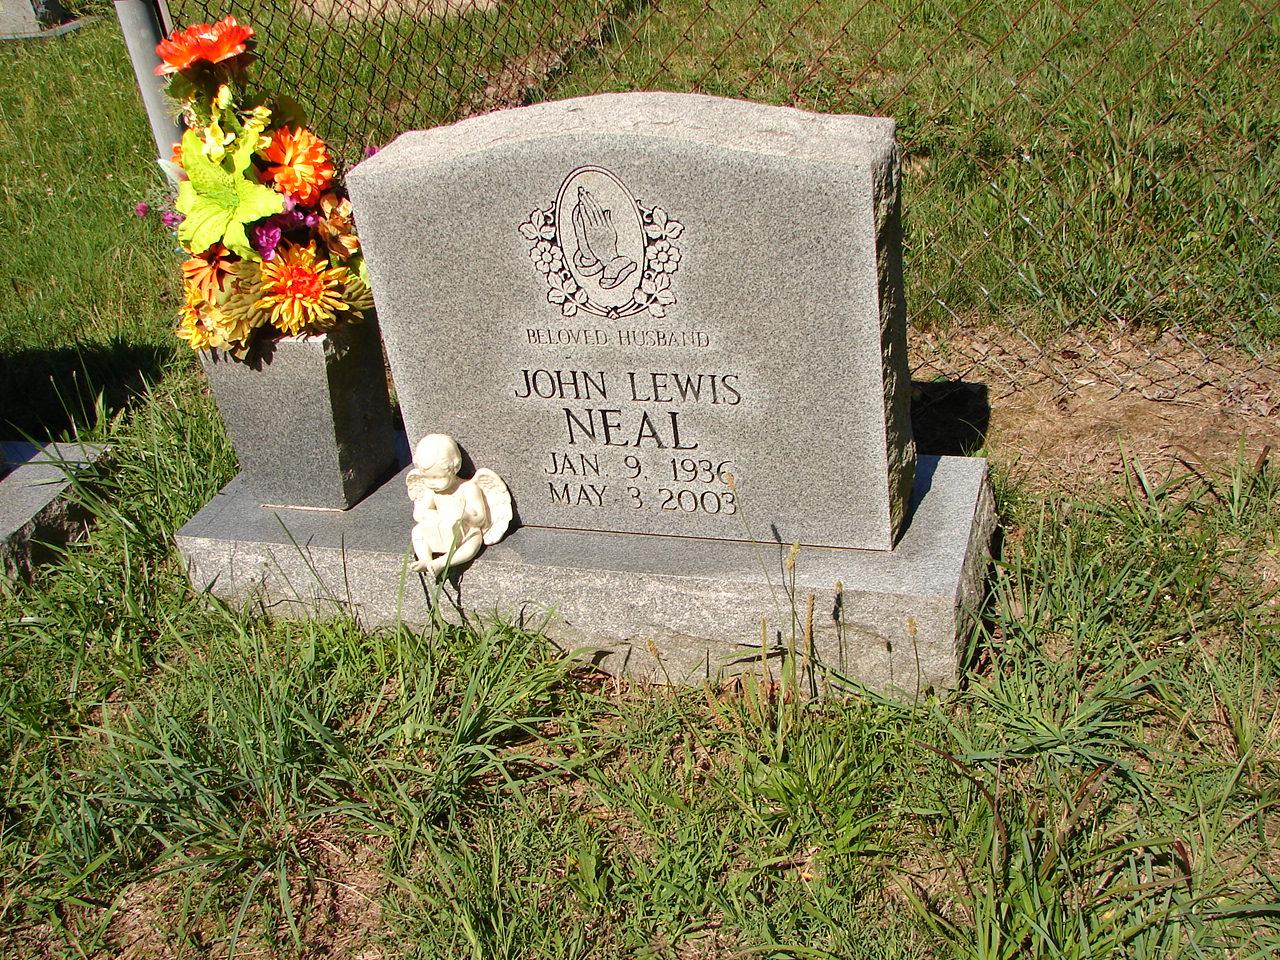 John lewis neal 1936 2003 find a grave memorial view original izmirmasajfo